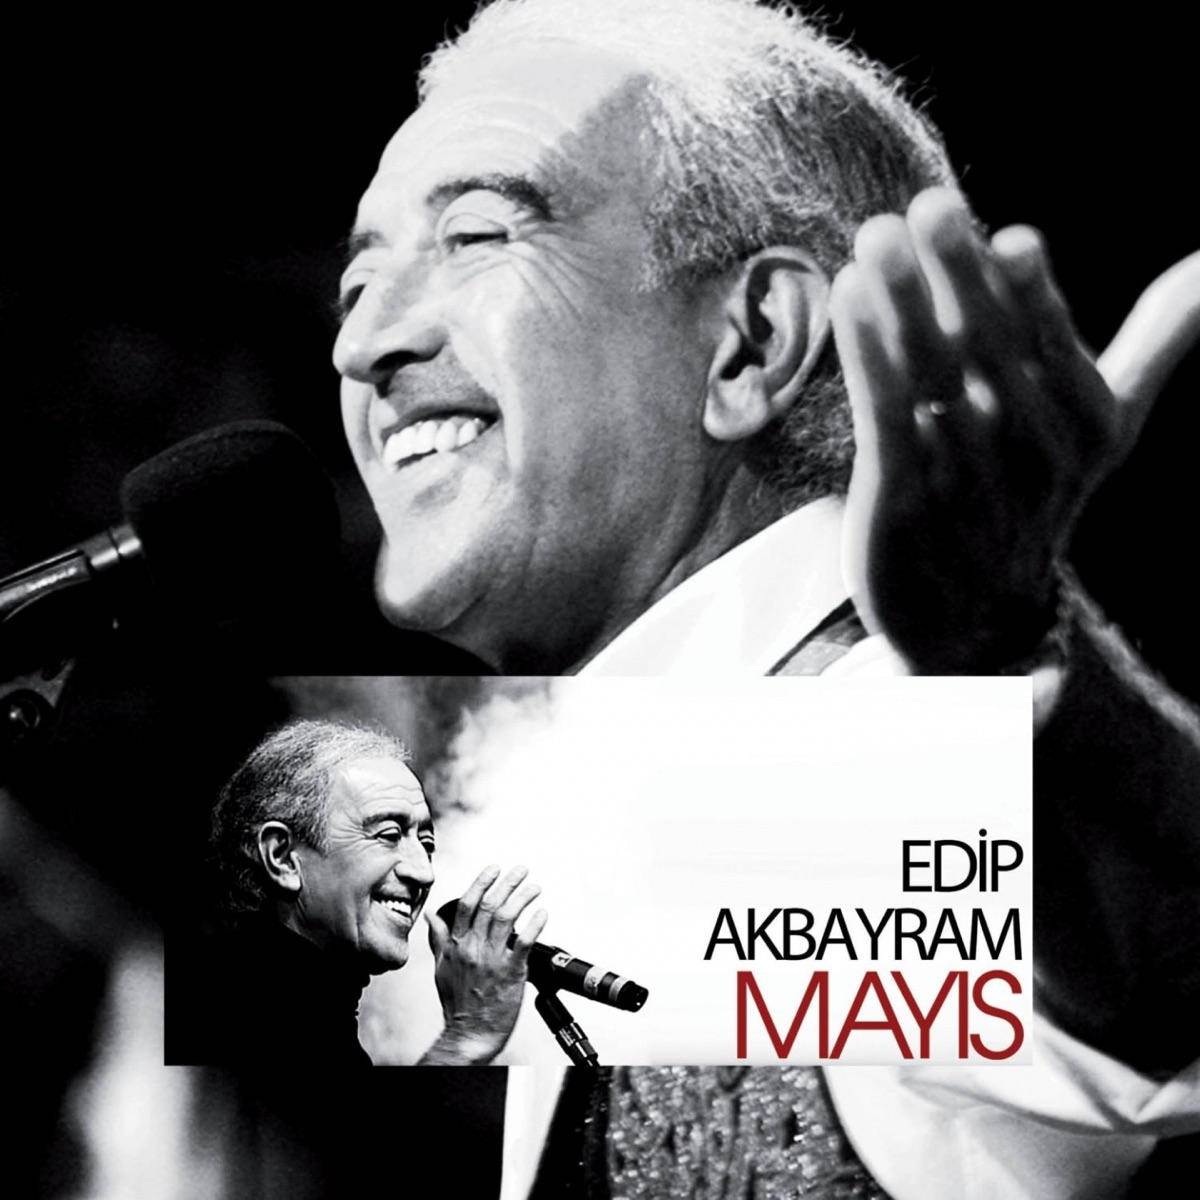 Edip Akbayram Full Albümleri indir